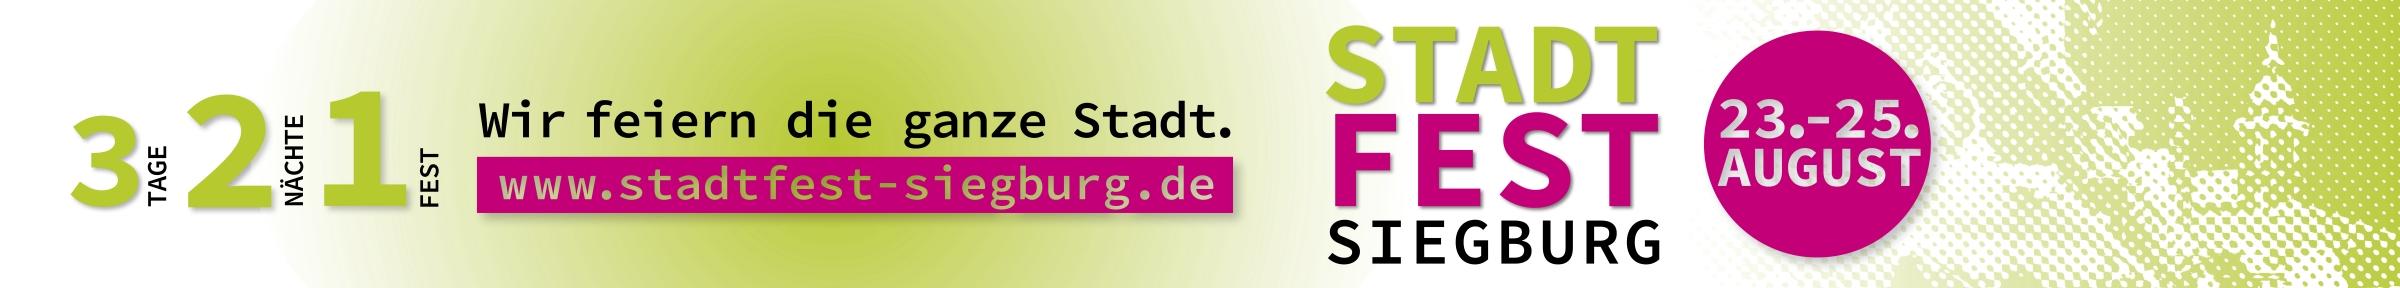 Stadtfest Siegburg 2019